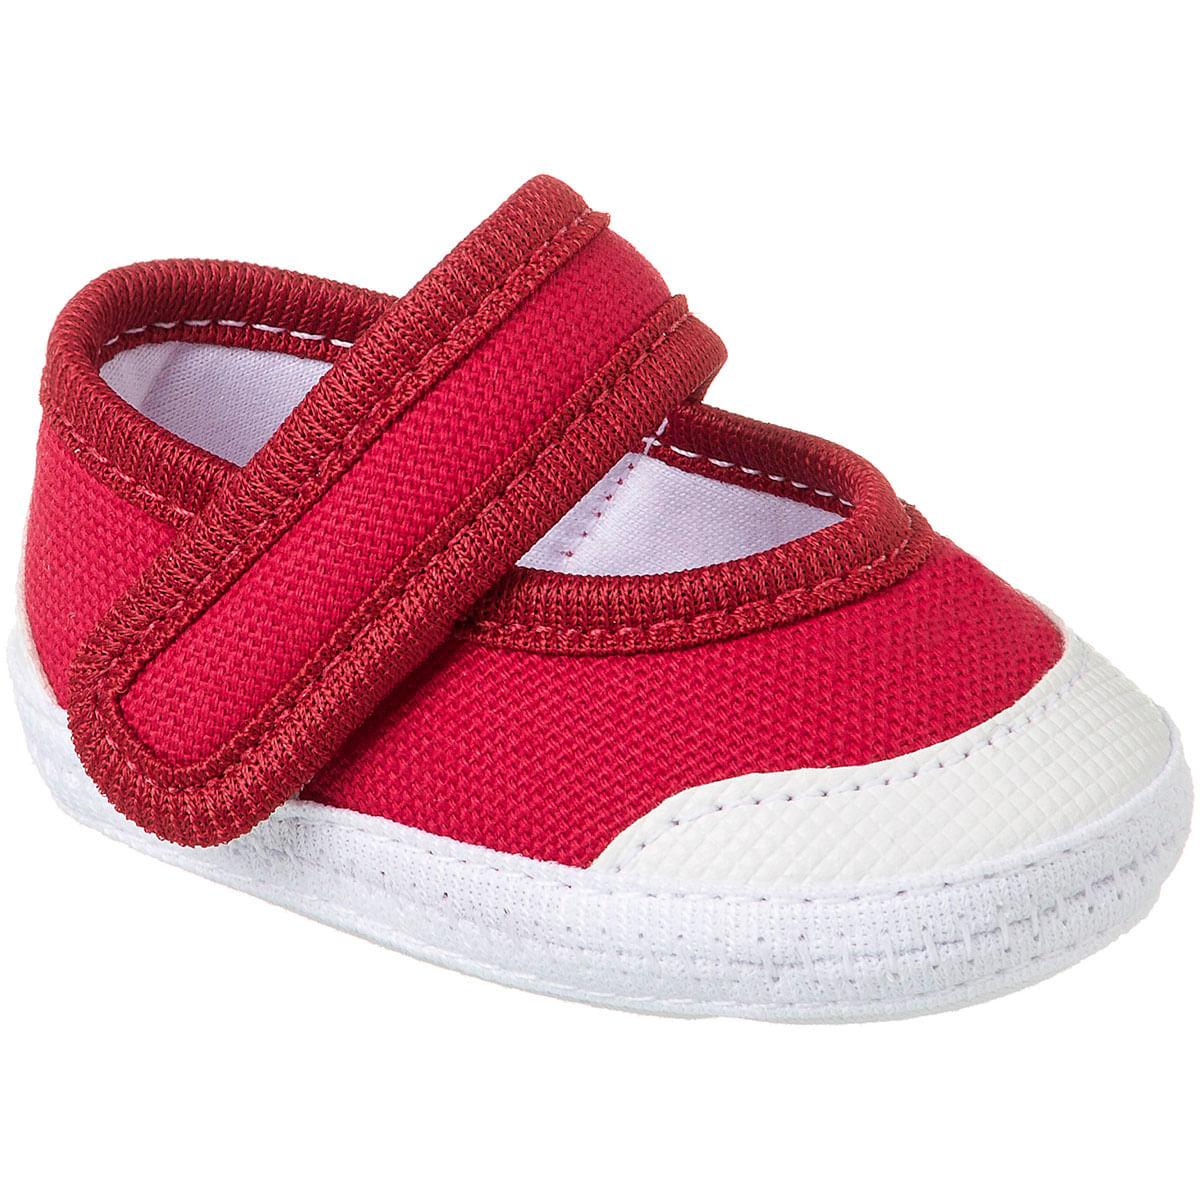 6b998dc71 Sapatilha para bebê Vermelho - Keto Baby - bebefacil